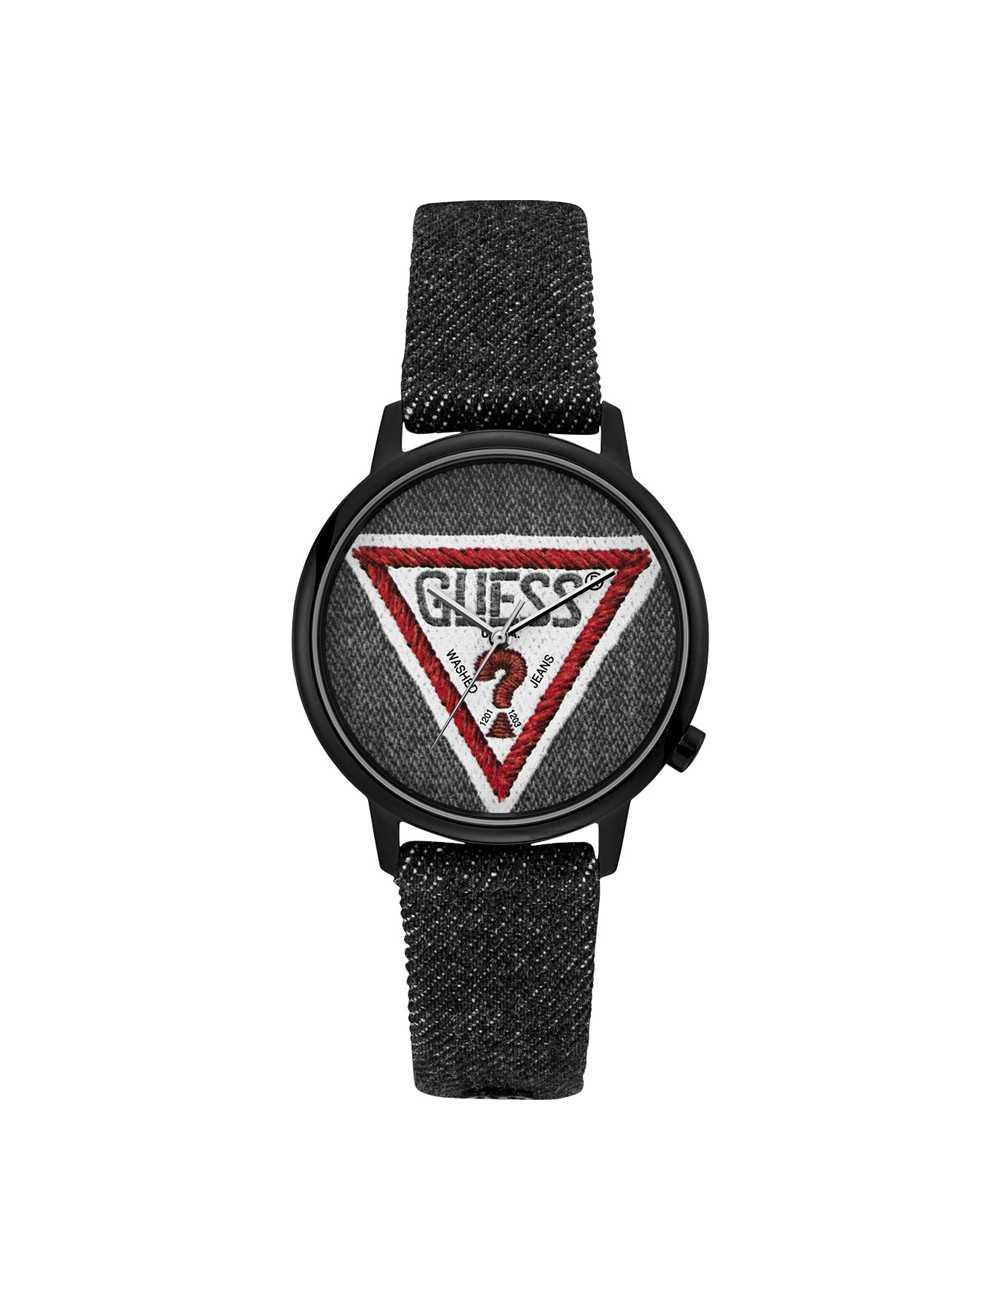 Dámske hodinky Guess Wilshire & Grand V1014M2